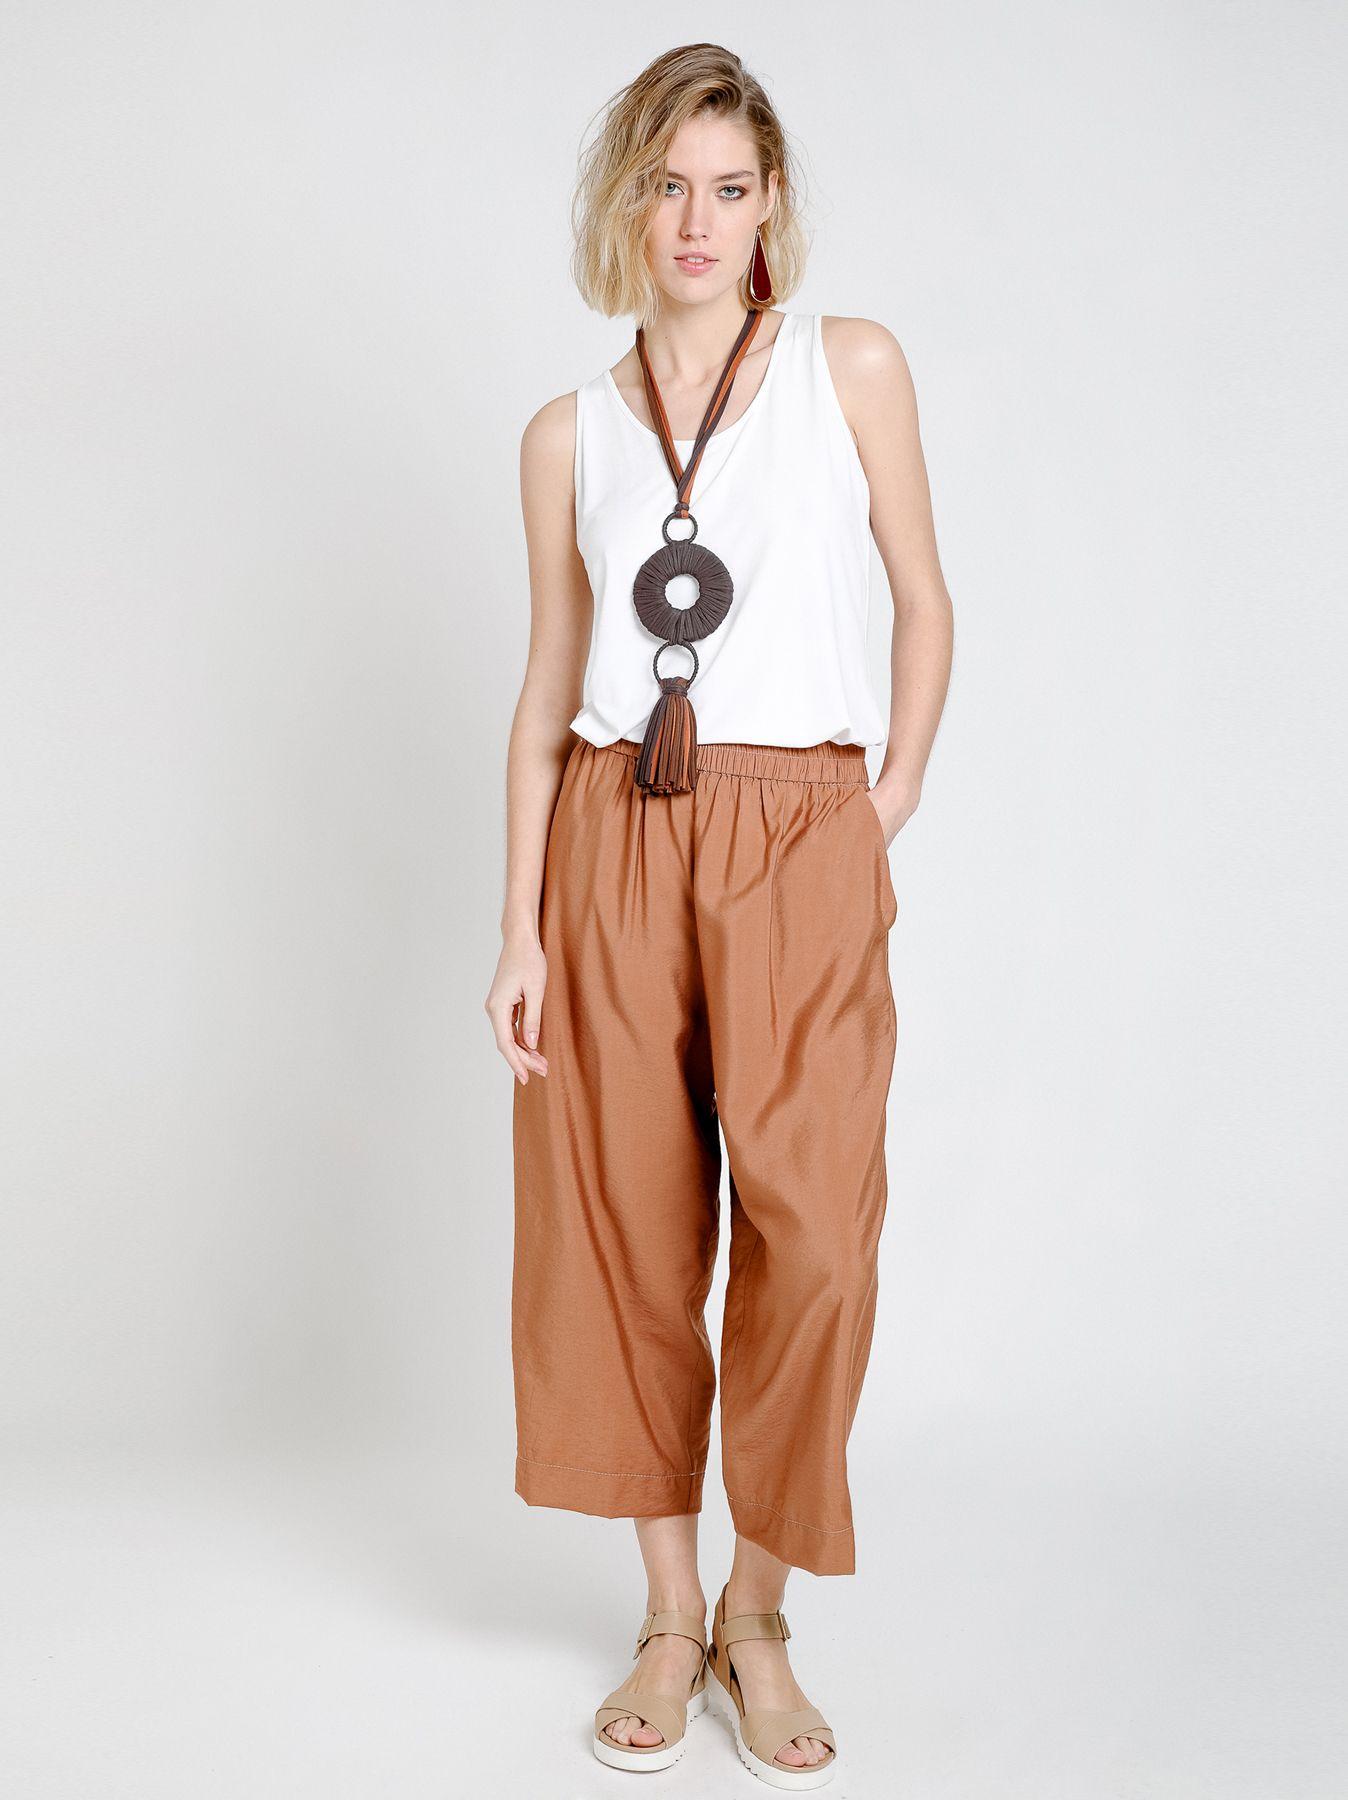 Gaucho trousers